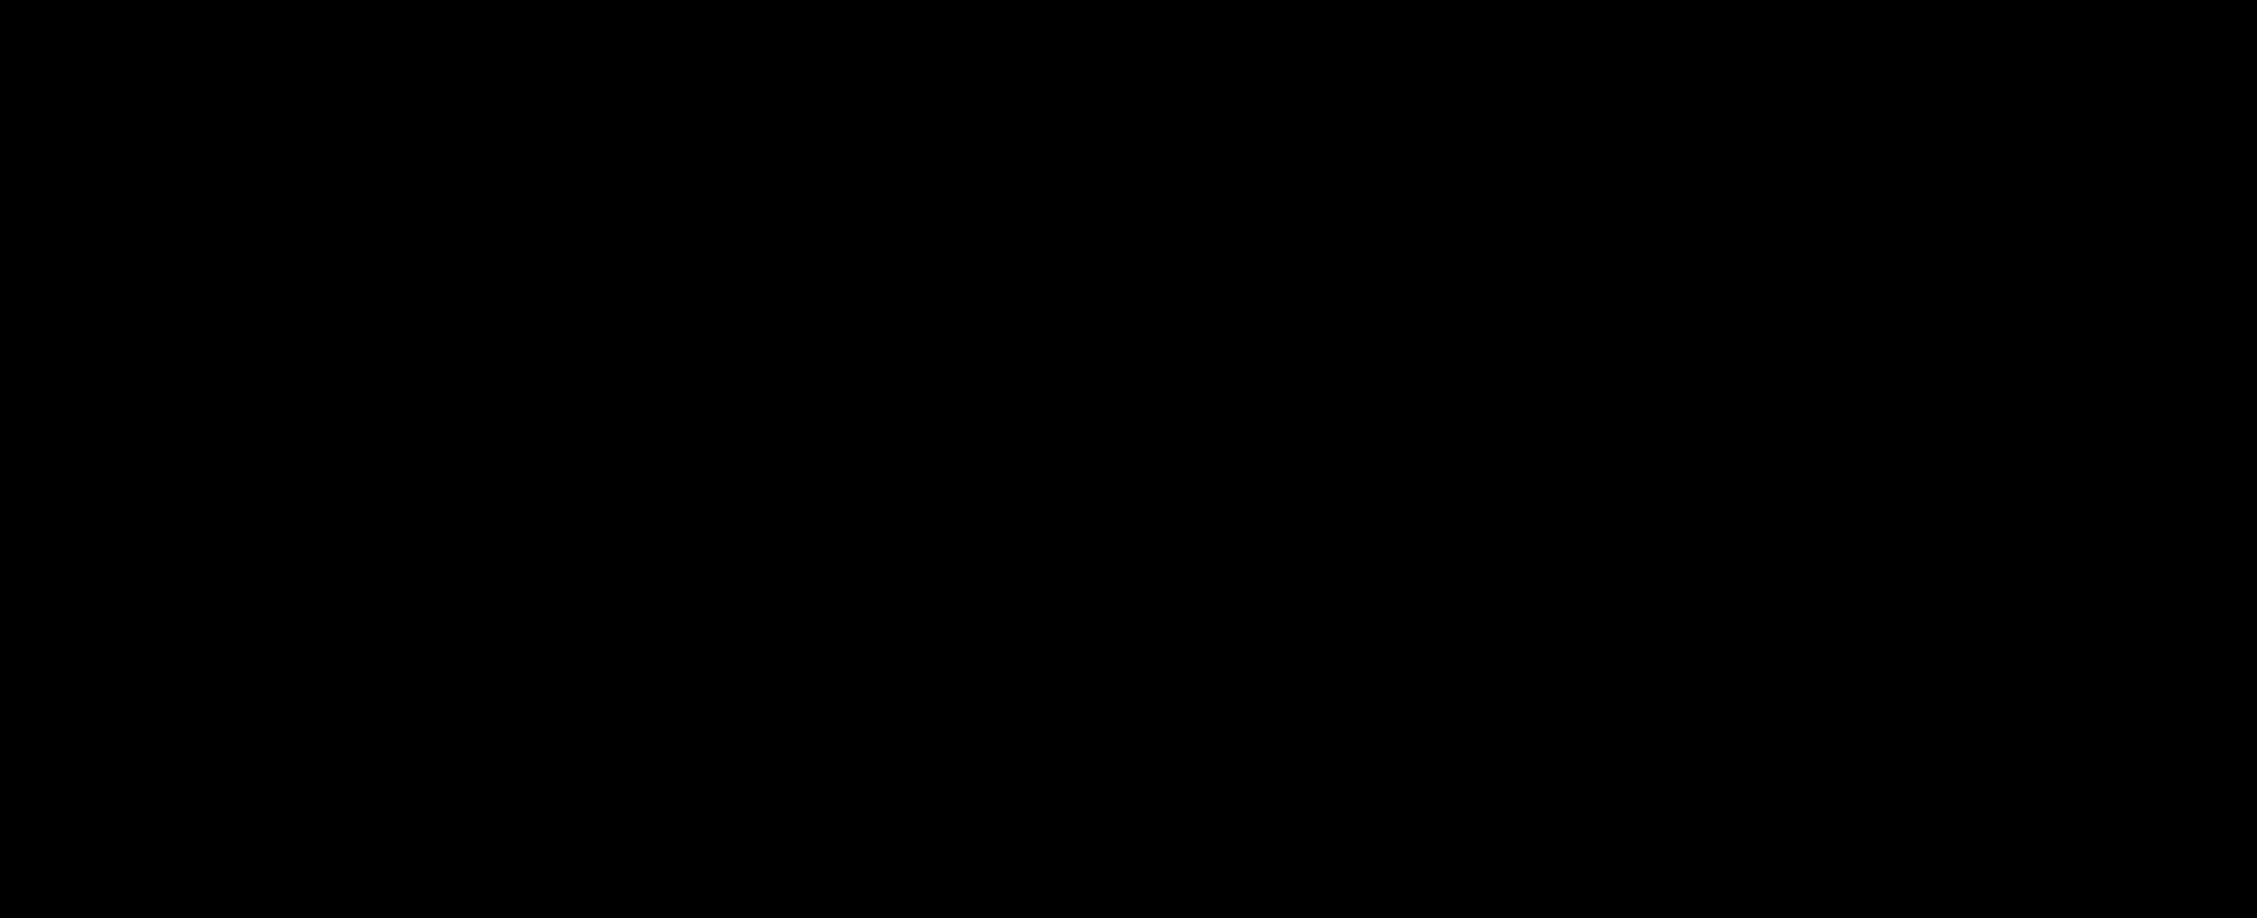 T63-d<sub>3</sub>